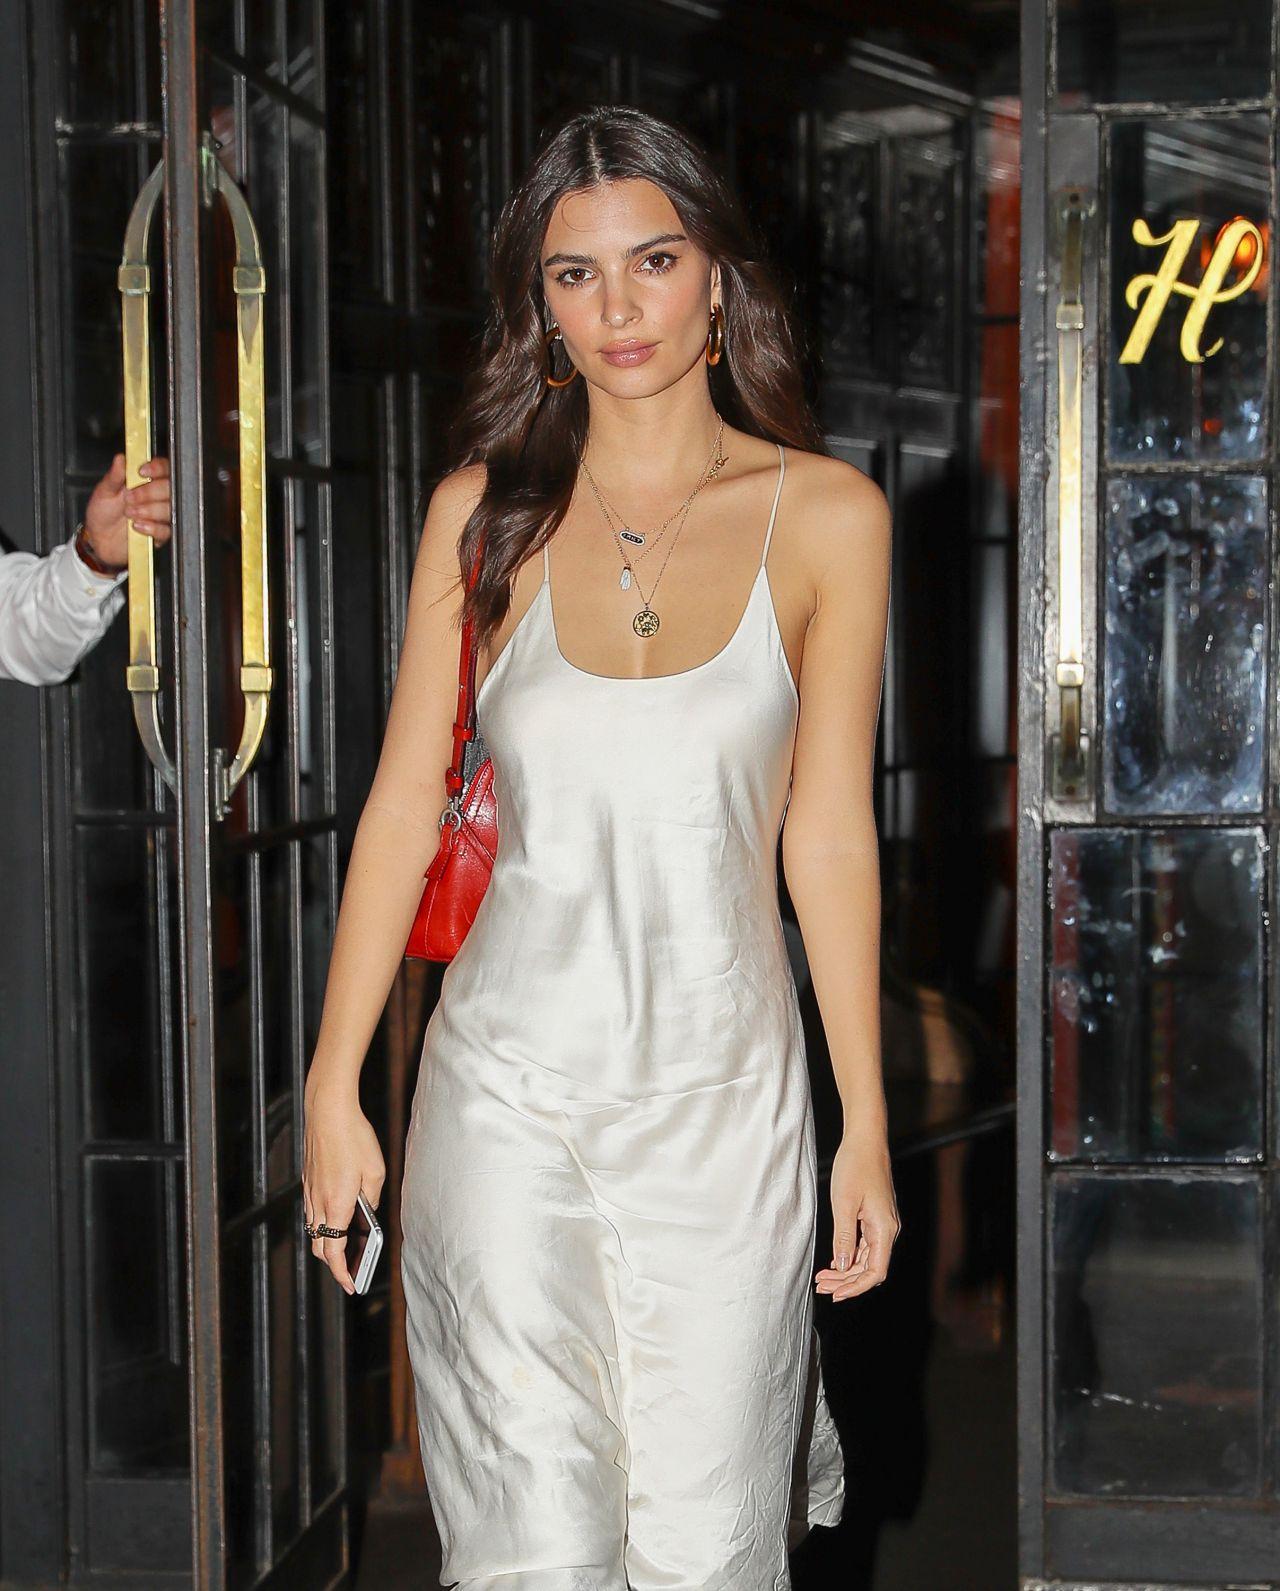 Movie elizabeth banks dating new york city paris 2019